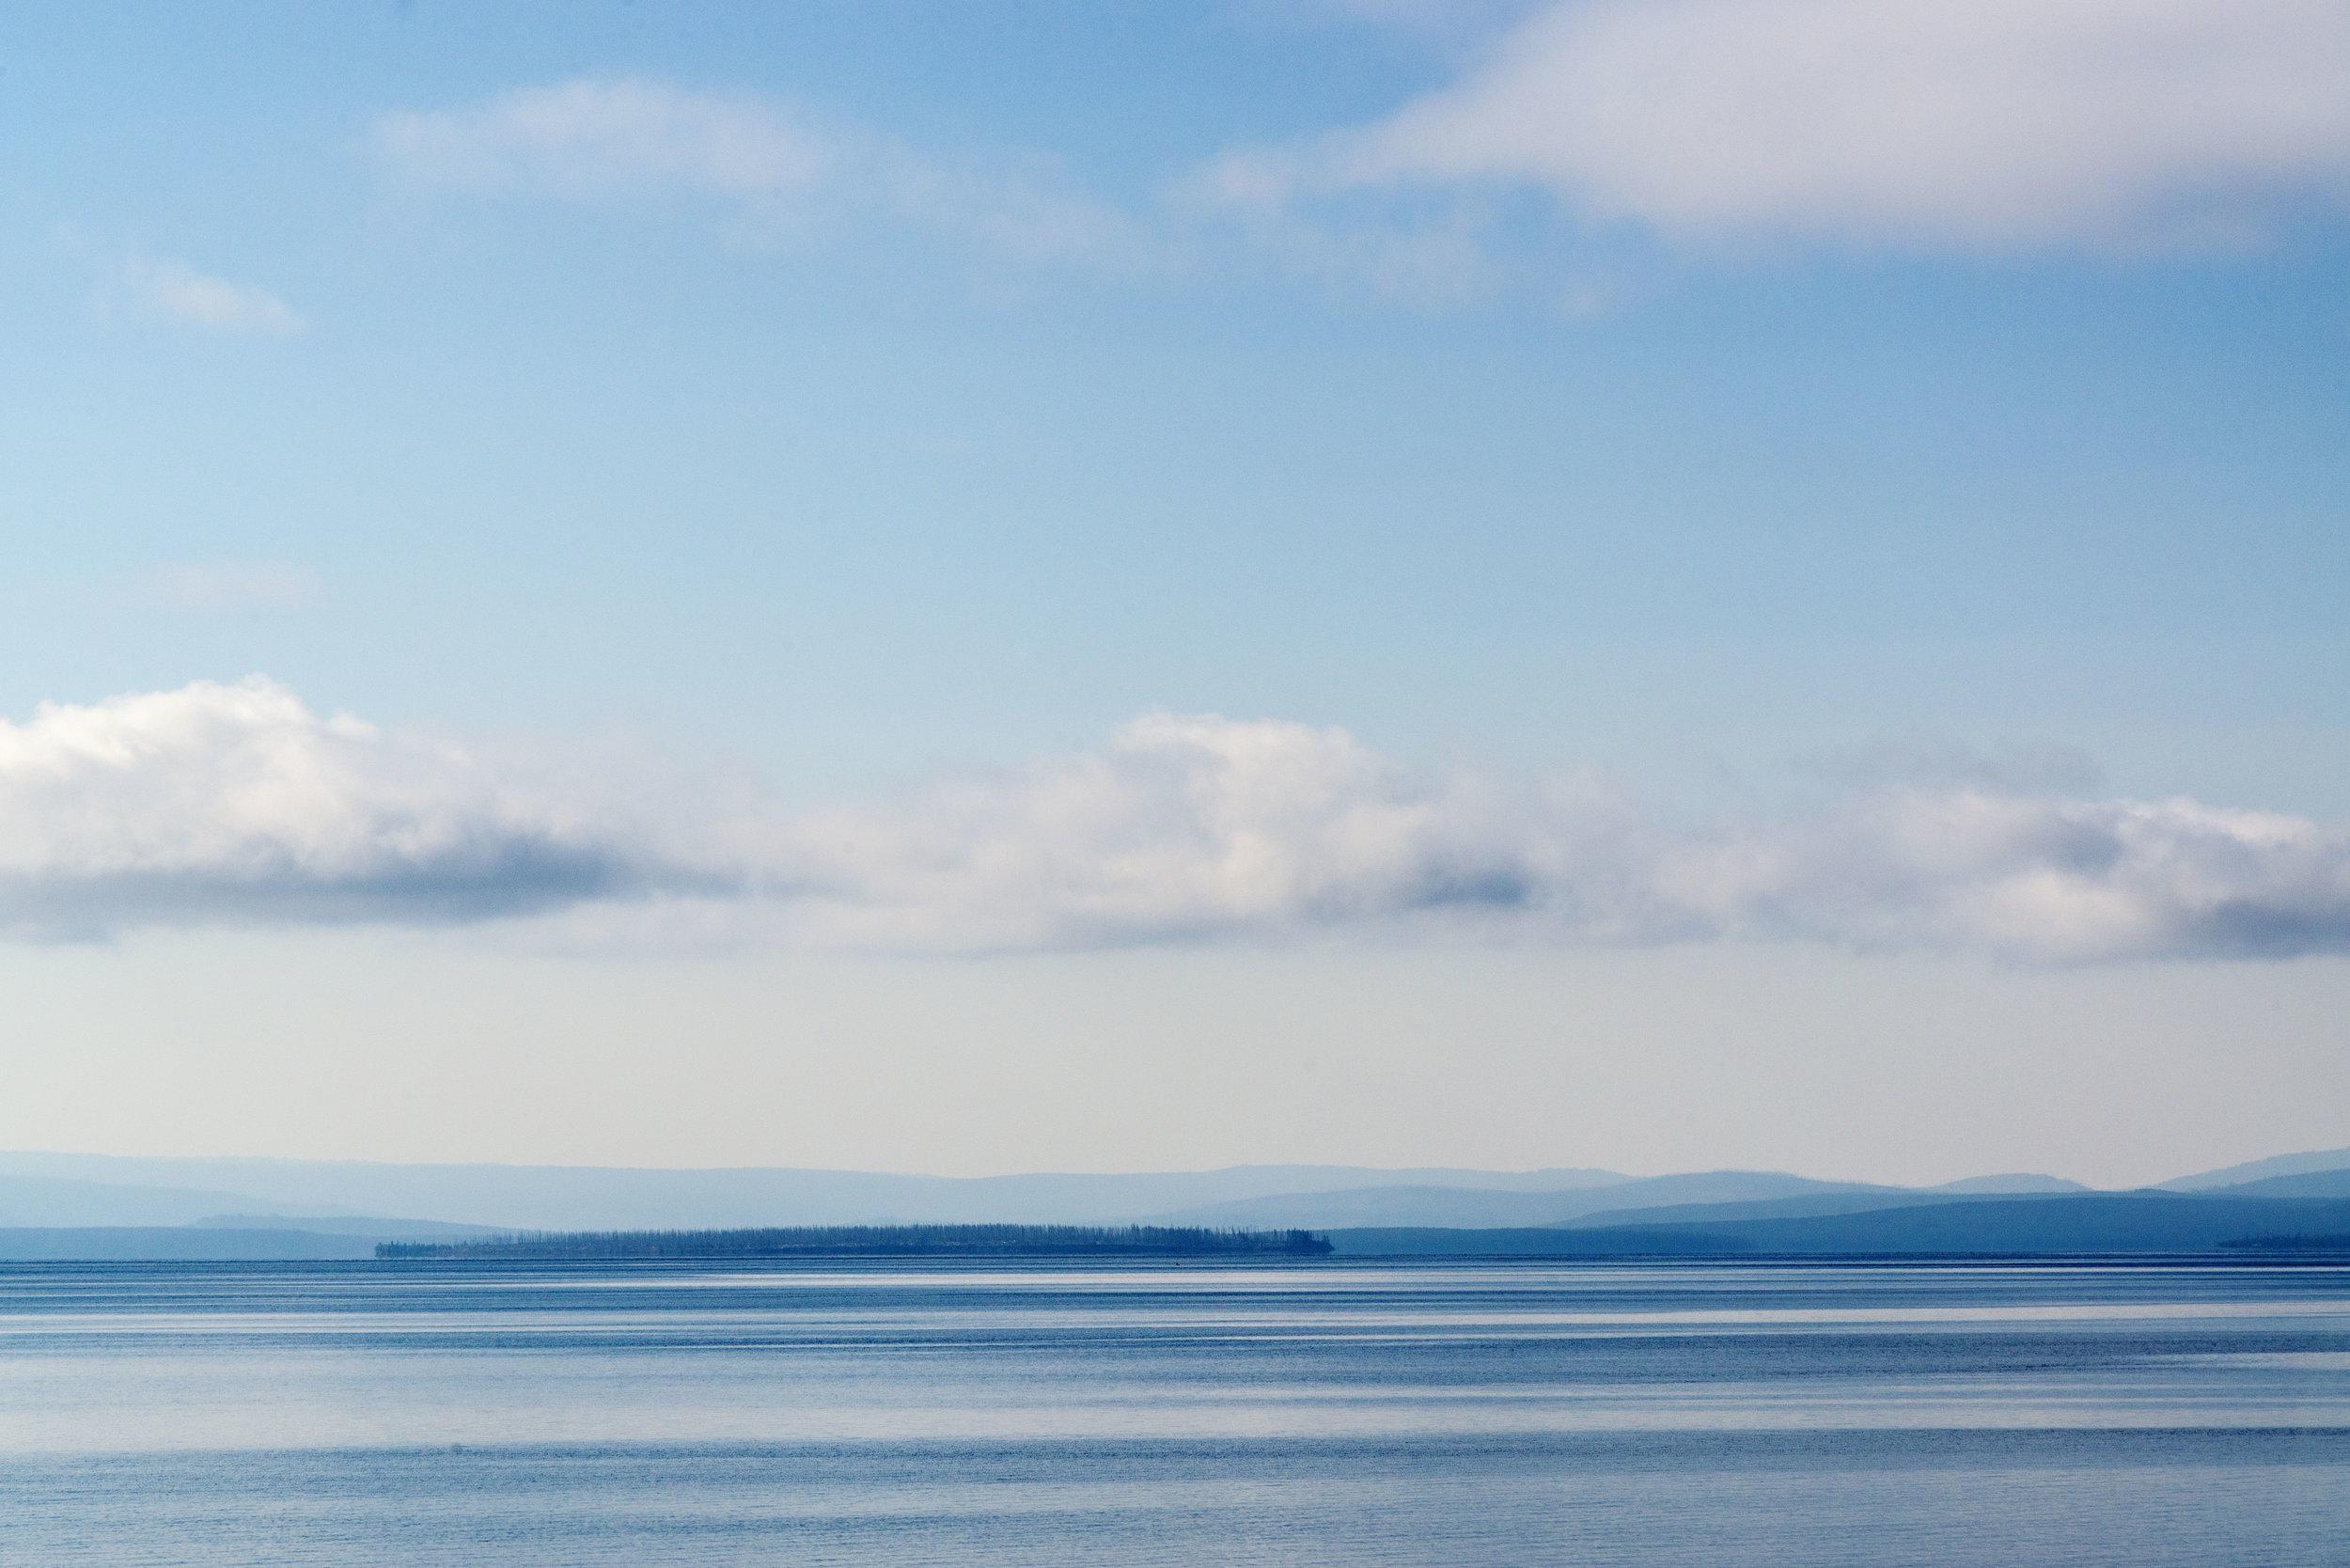 Yellowstone Lake. Nikon D800, Nikkor 24-120mm lens @ 120mm, ISO 200, f13, 1/1600 sec, -1 stop exposure adjustment.